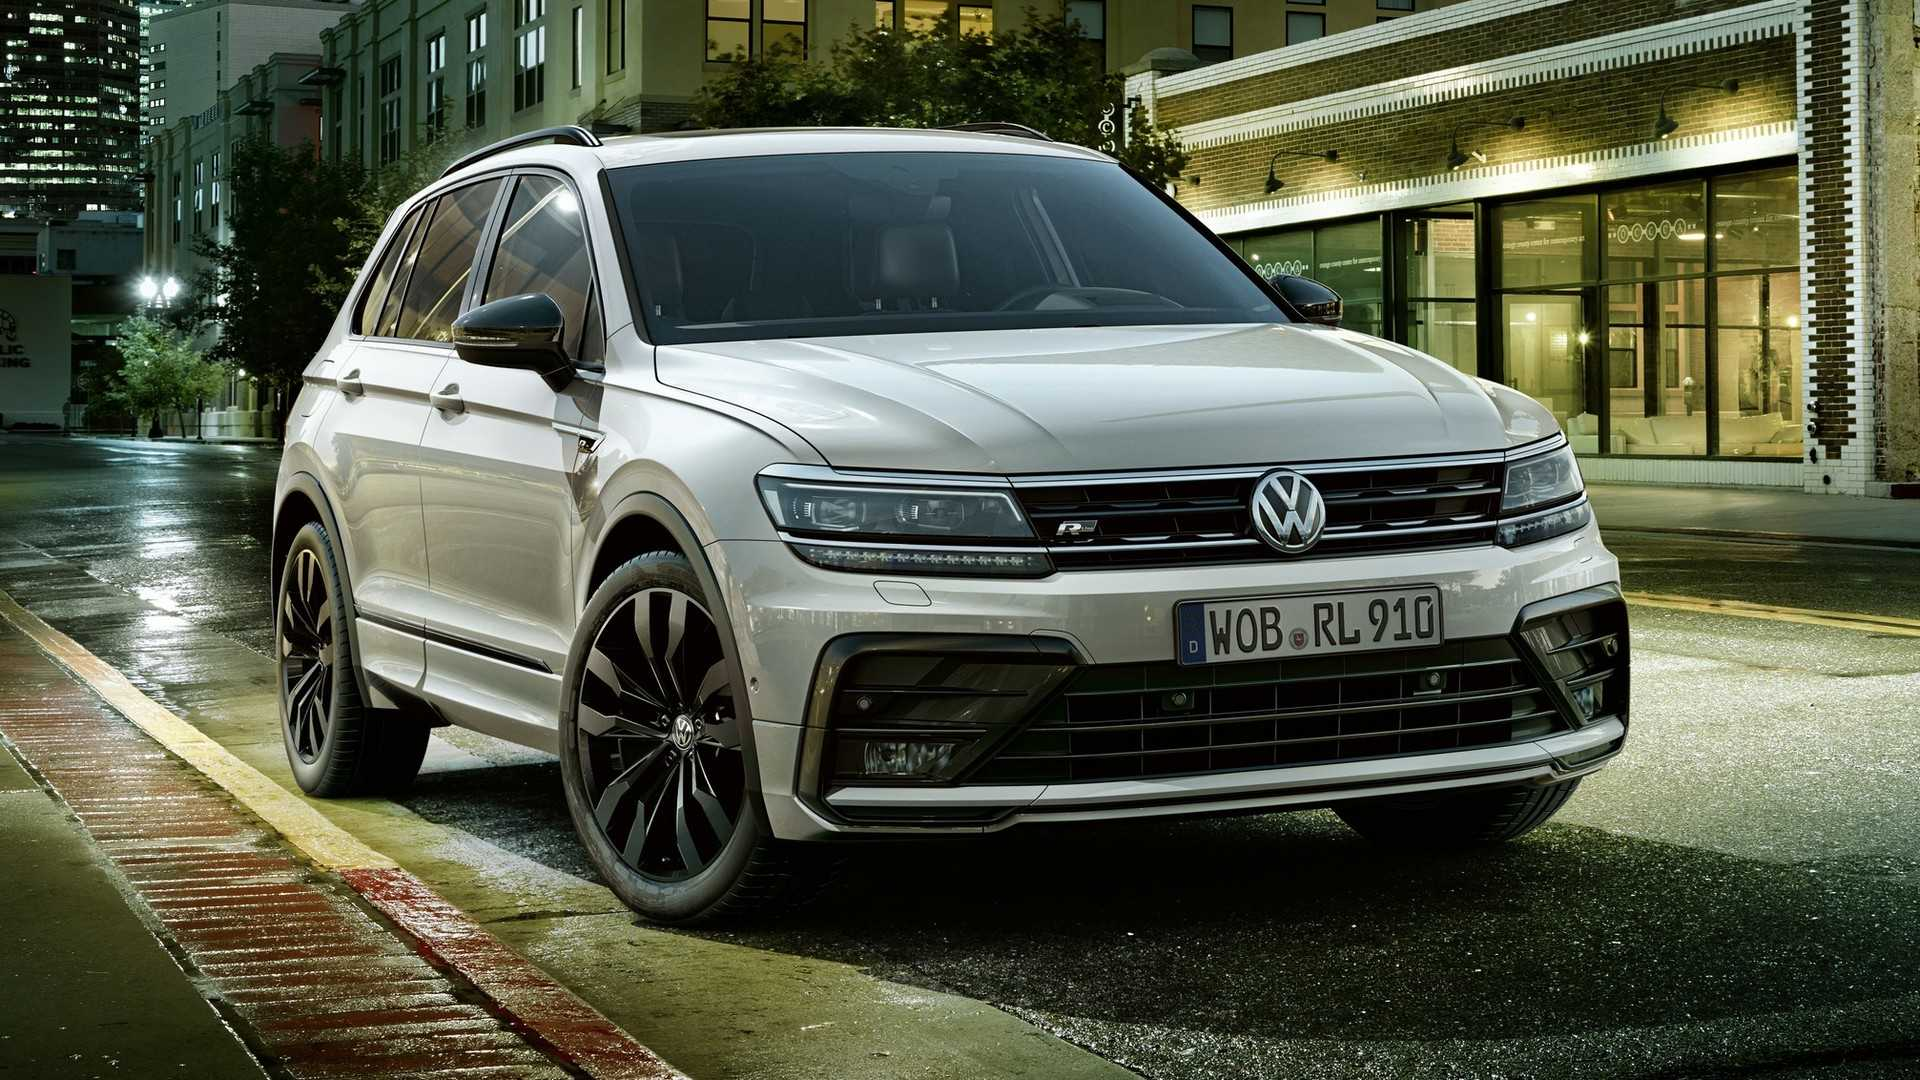 2016 - [Volkswagen] Tiguan II - Page 23 Vw-tiguan-black-style-r-line-design-package